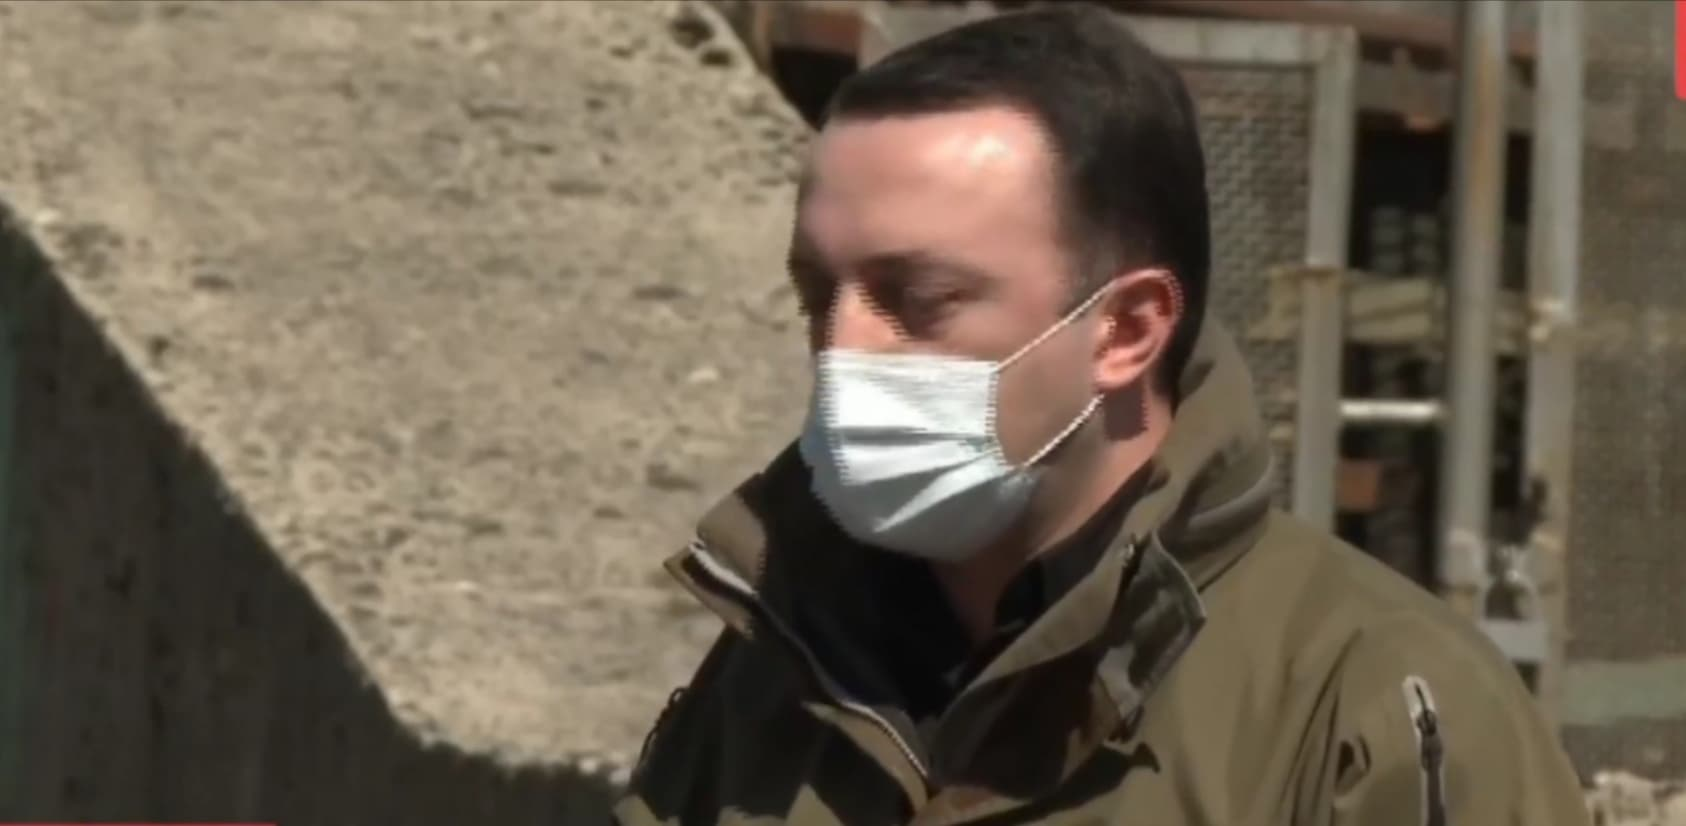 garibashvili #новости Грузия, Ингури ГЭС, Иракий Гарибашвили, энергетика